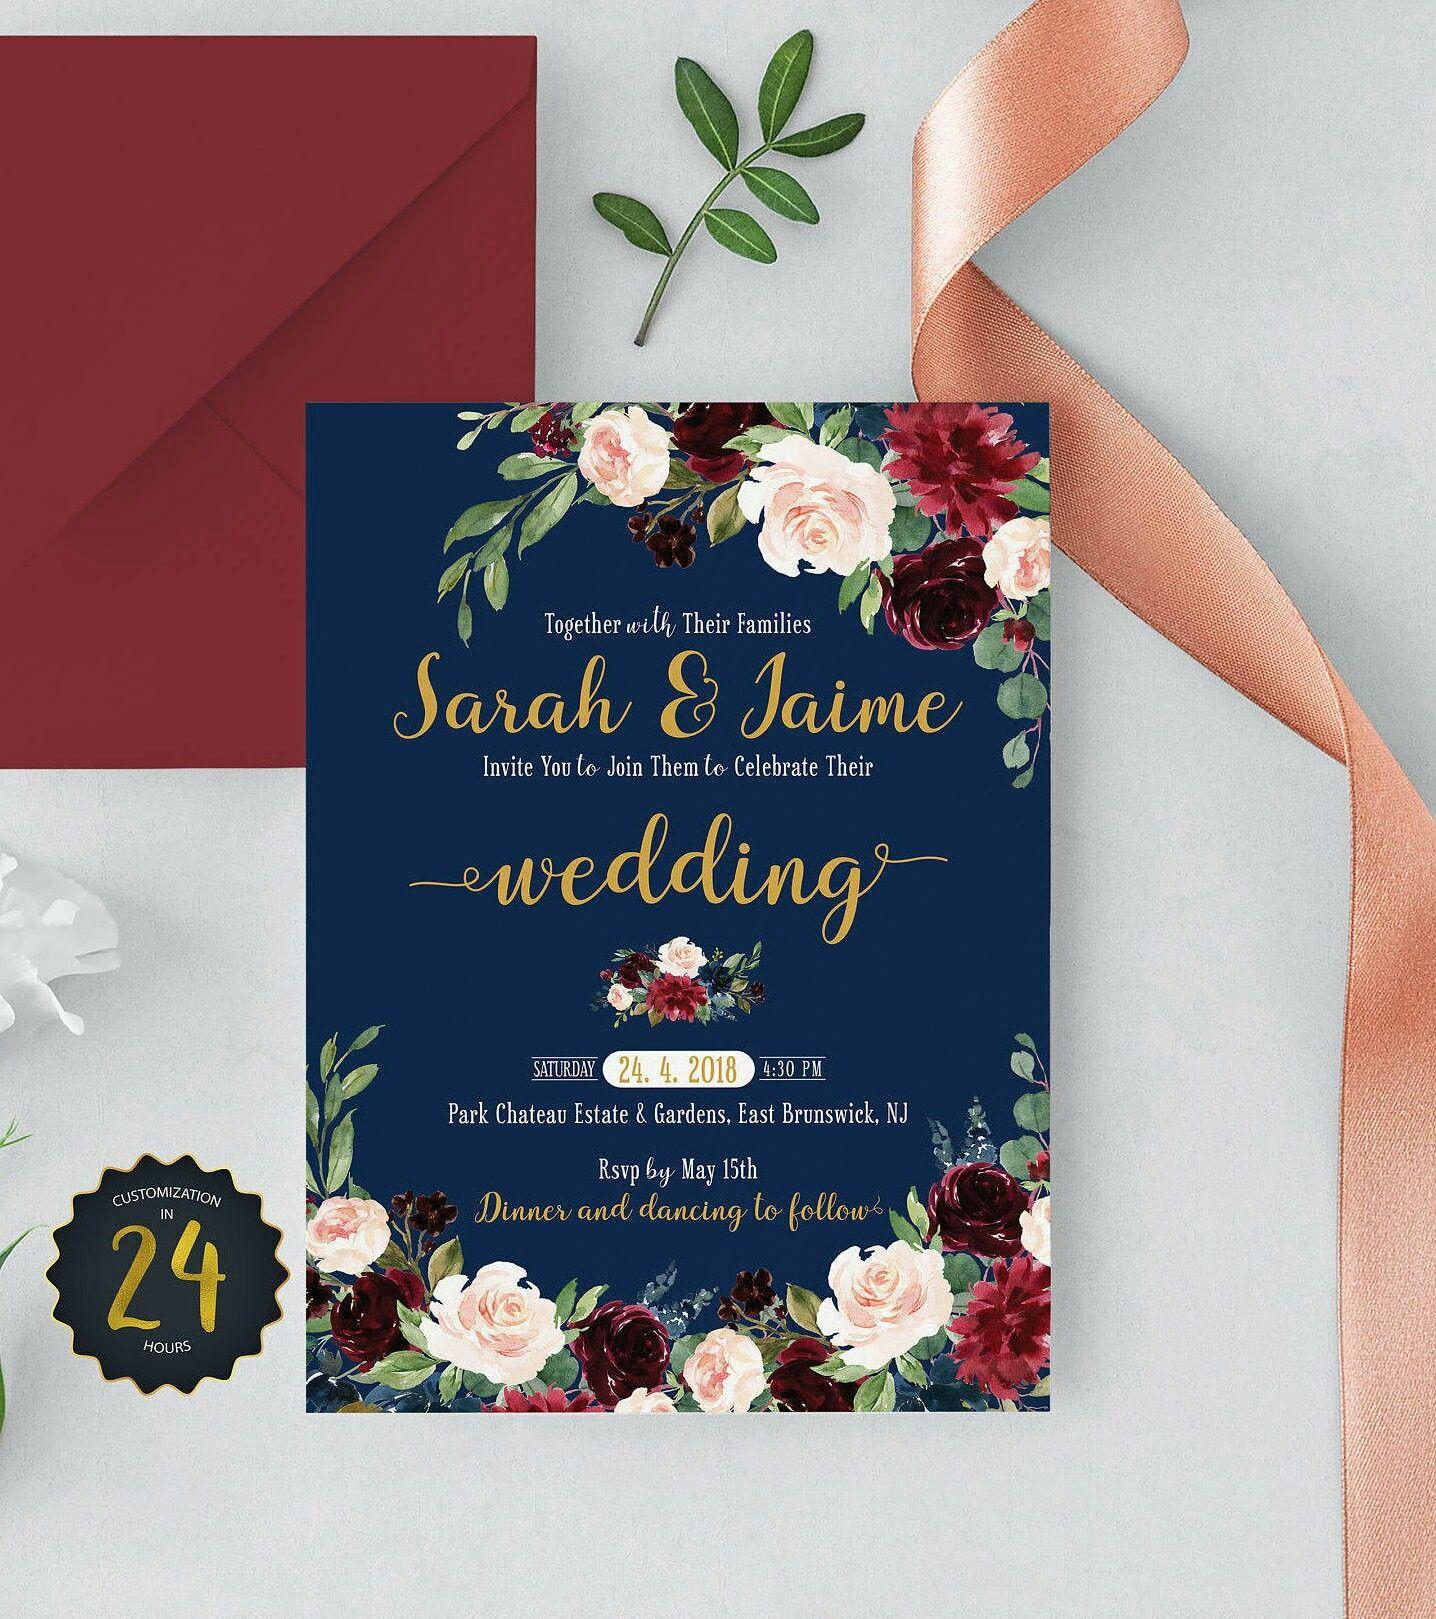 Burgundy and Navy wedding invitations